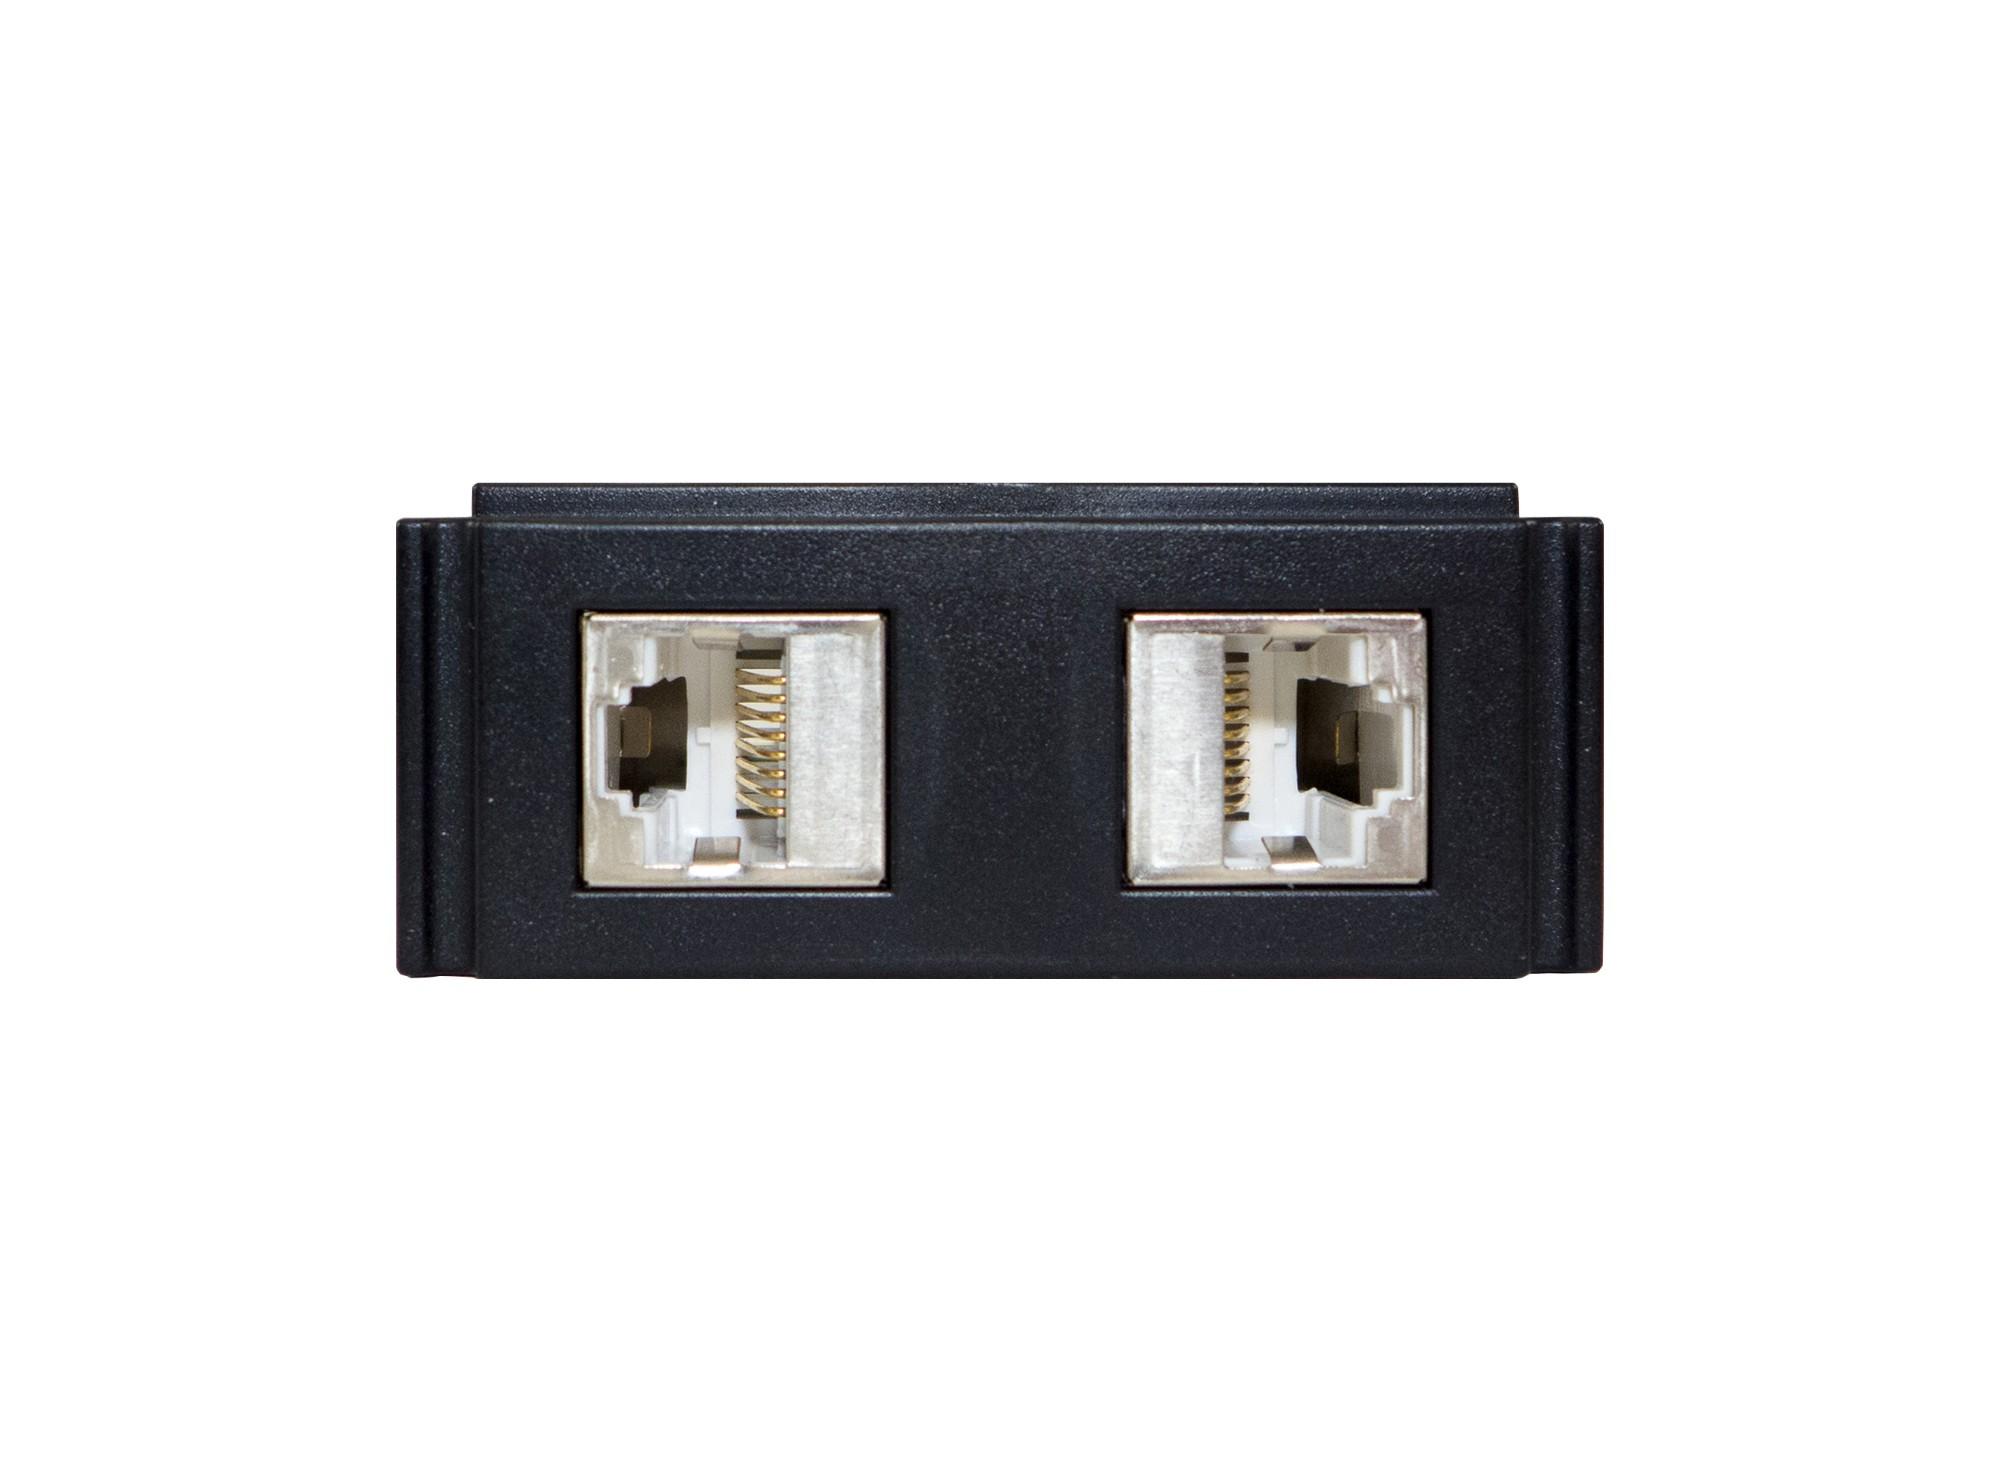 AMX HPX-N102-SRJ45 Fast Ethernet network switch module